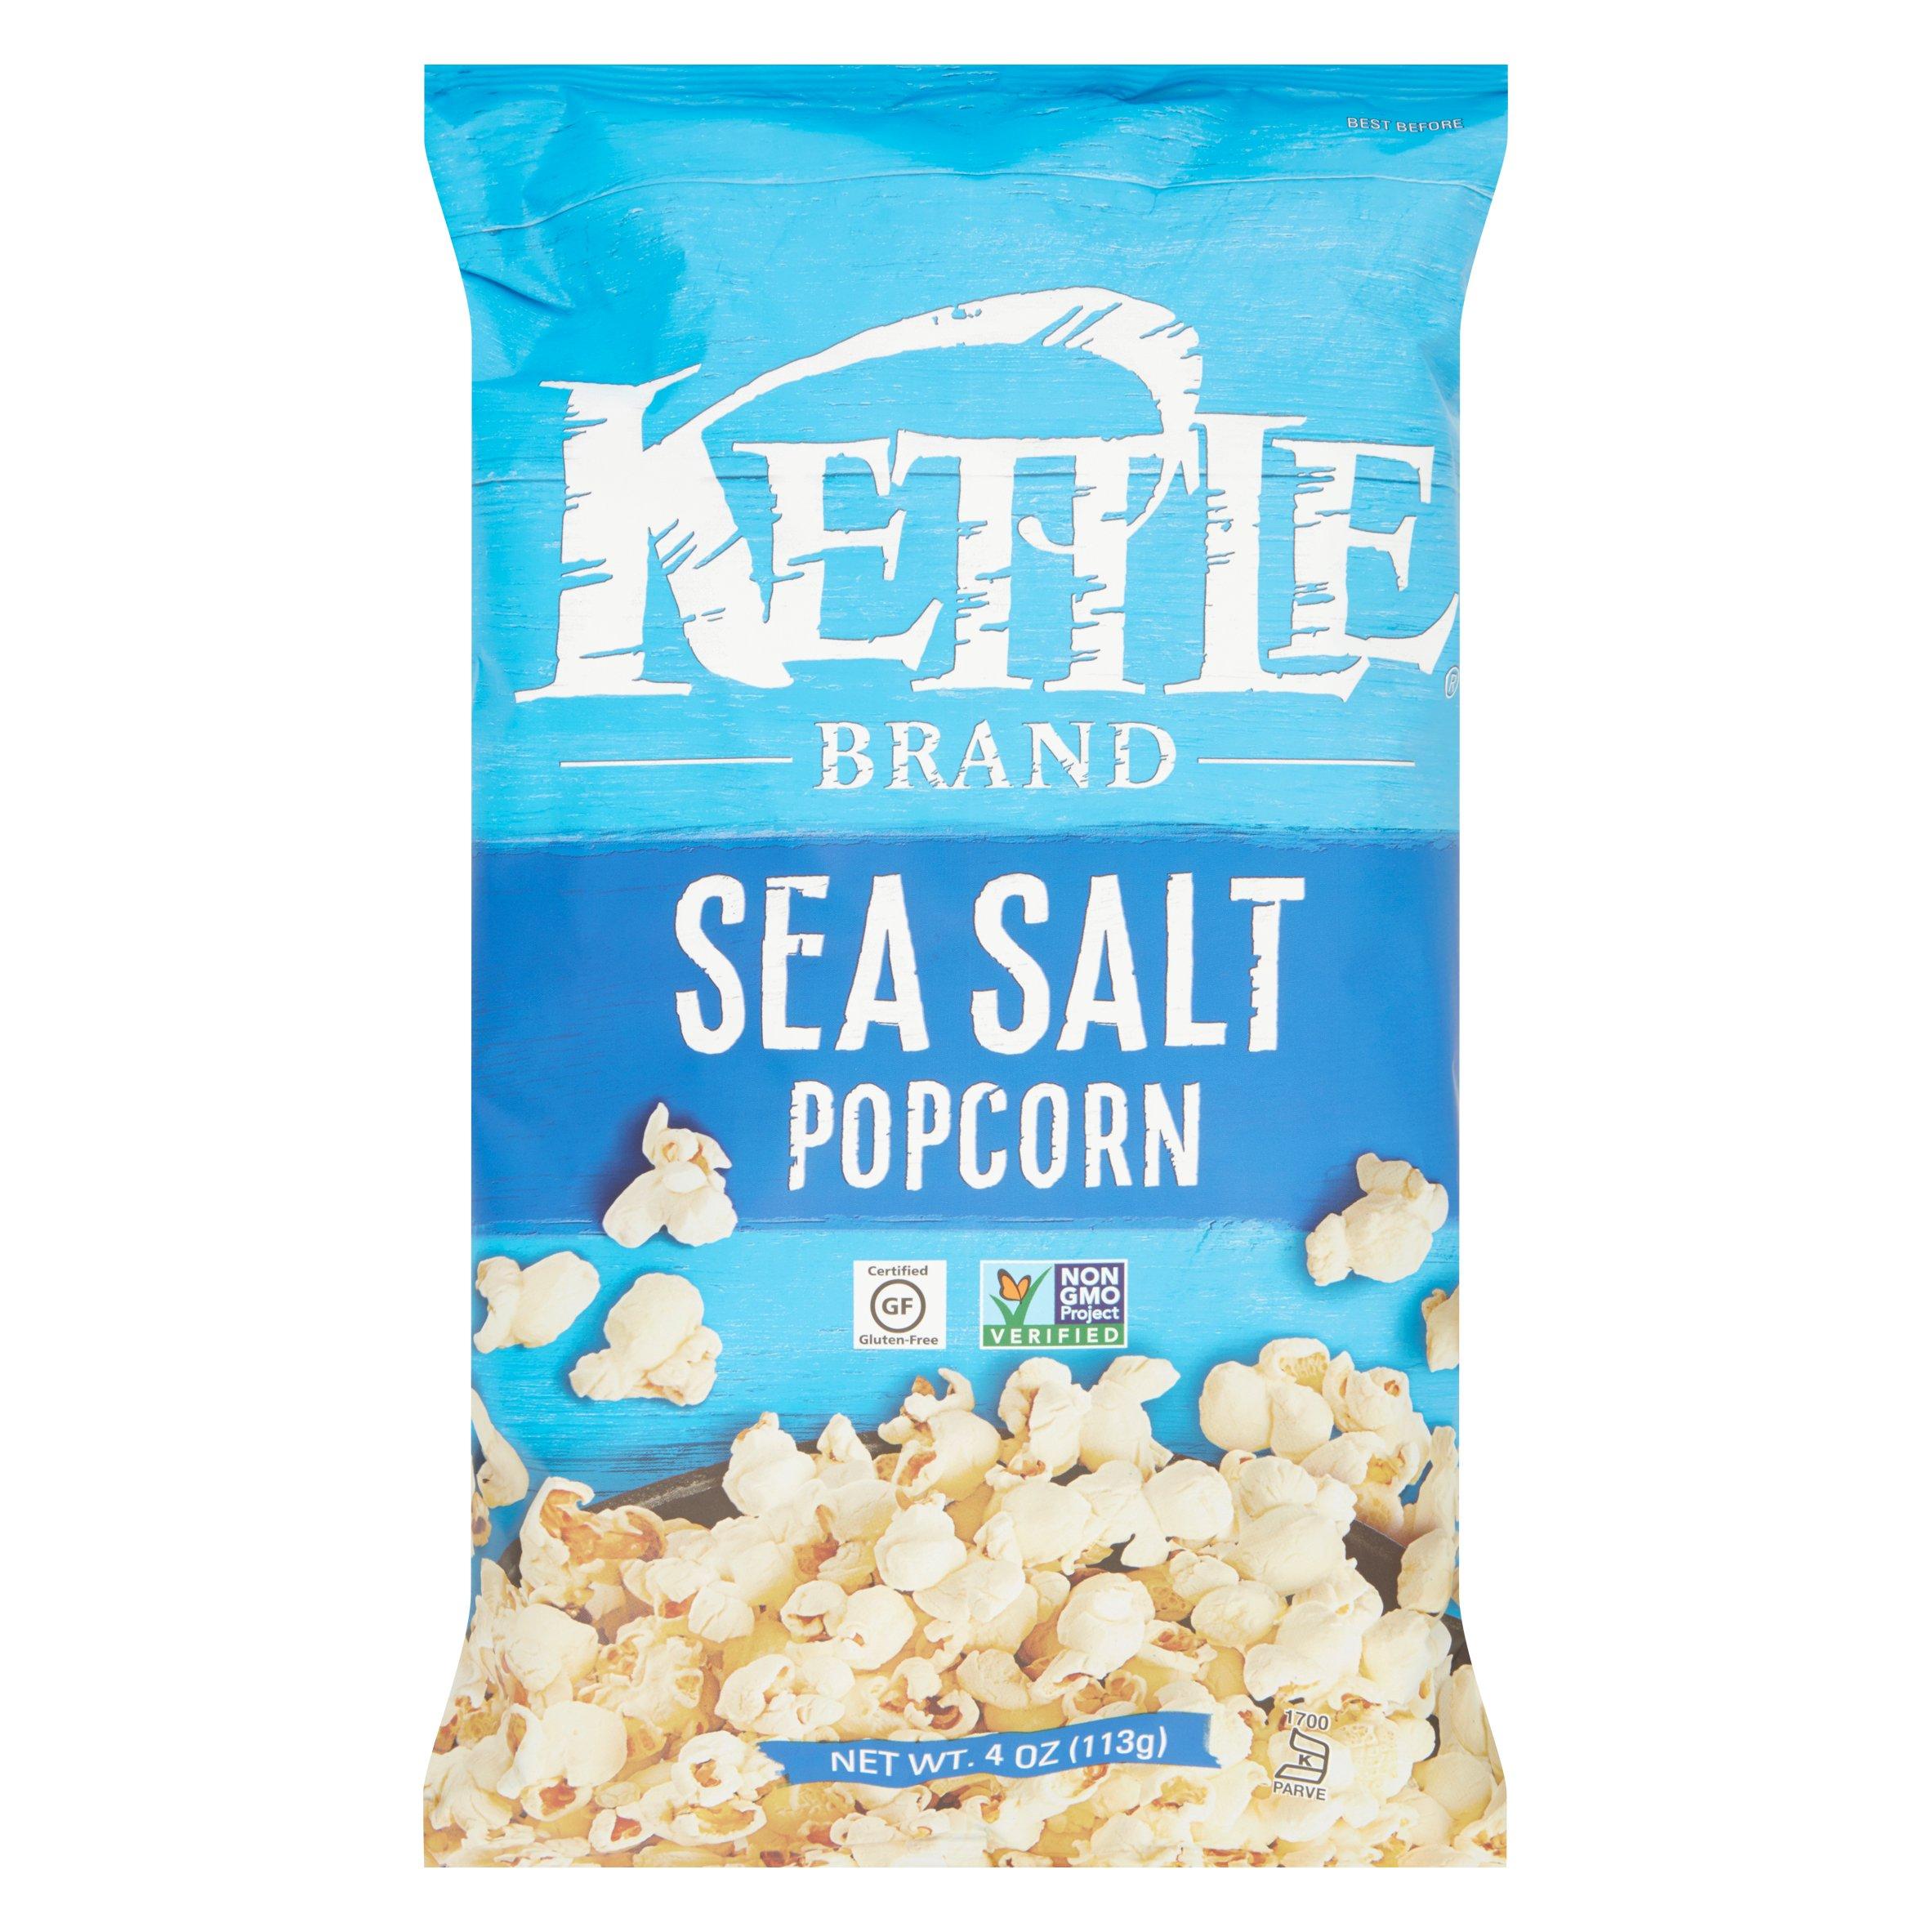 Kettle Brand Sea Salt Popcorn, 4 oz